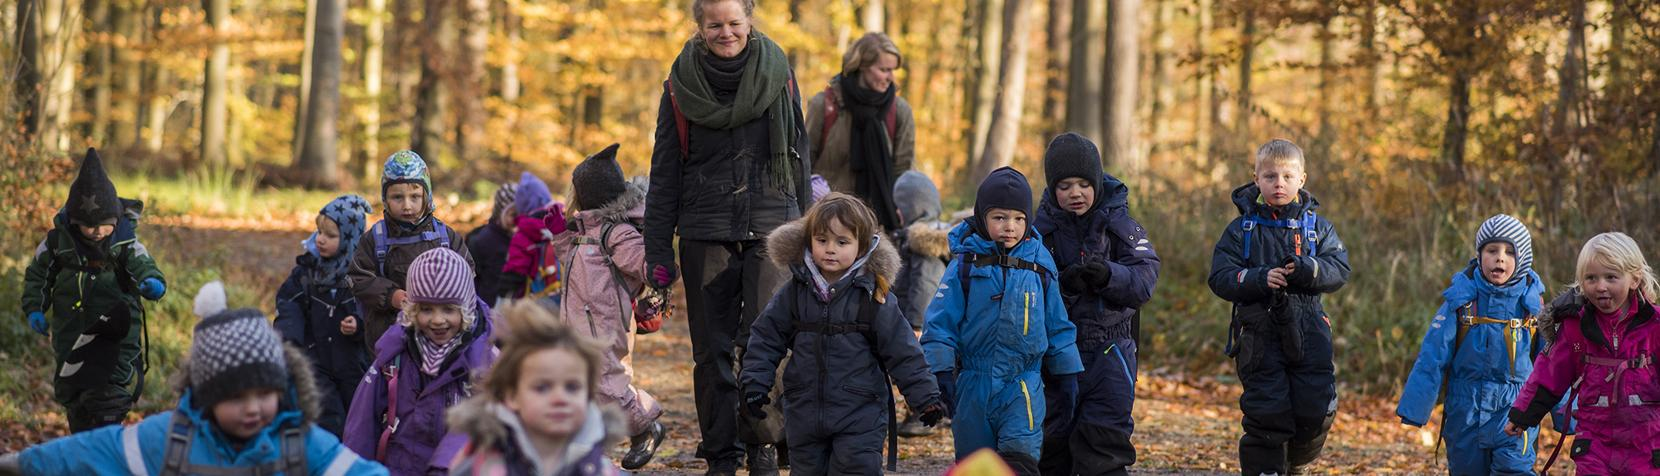 Tudsens børn på tur i skoven